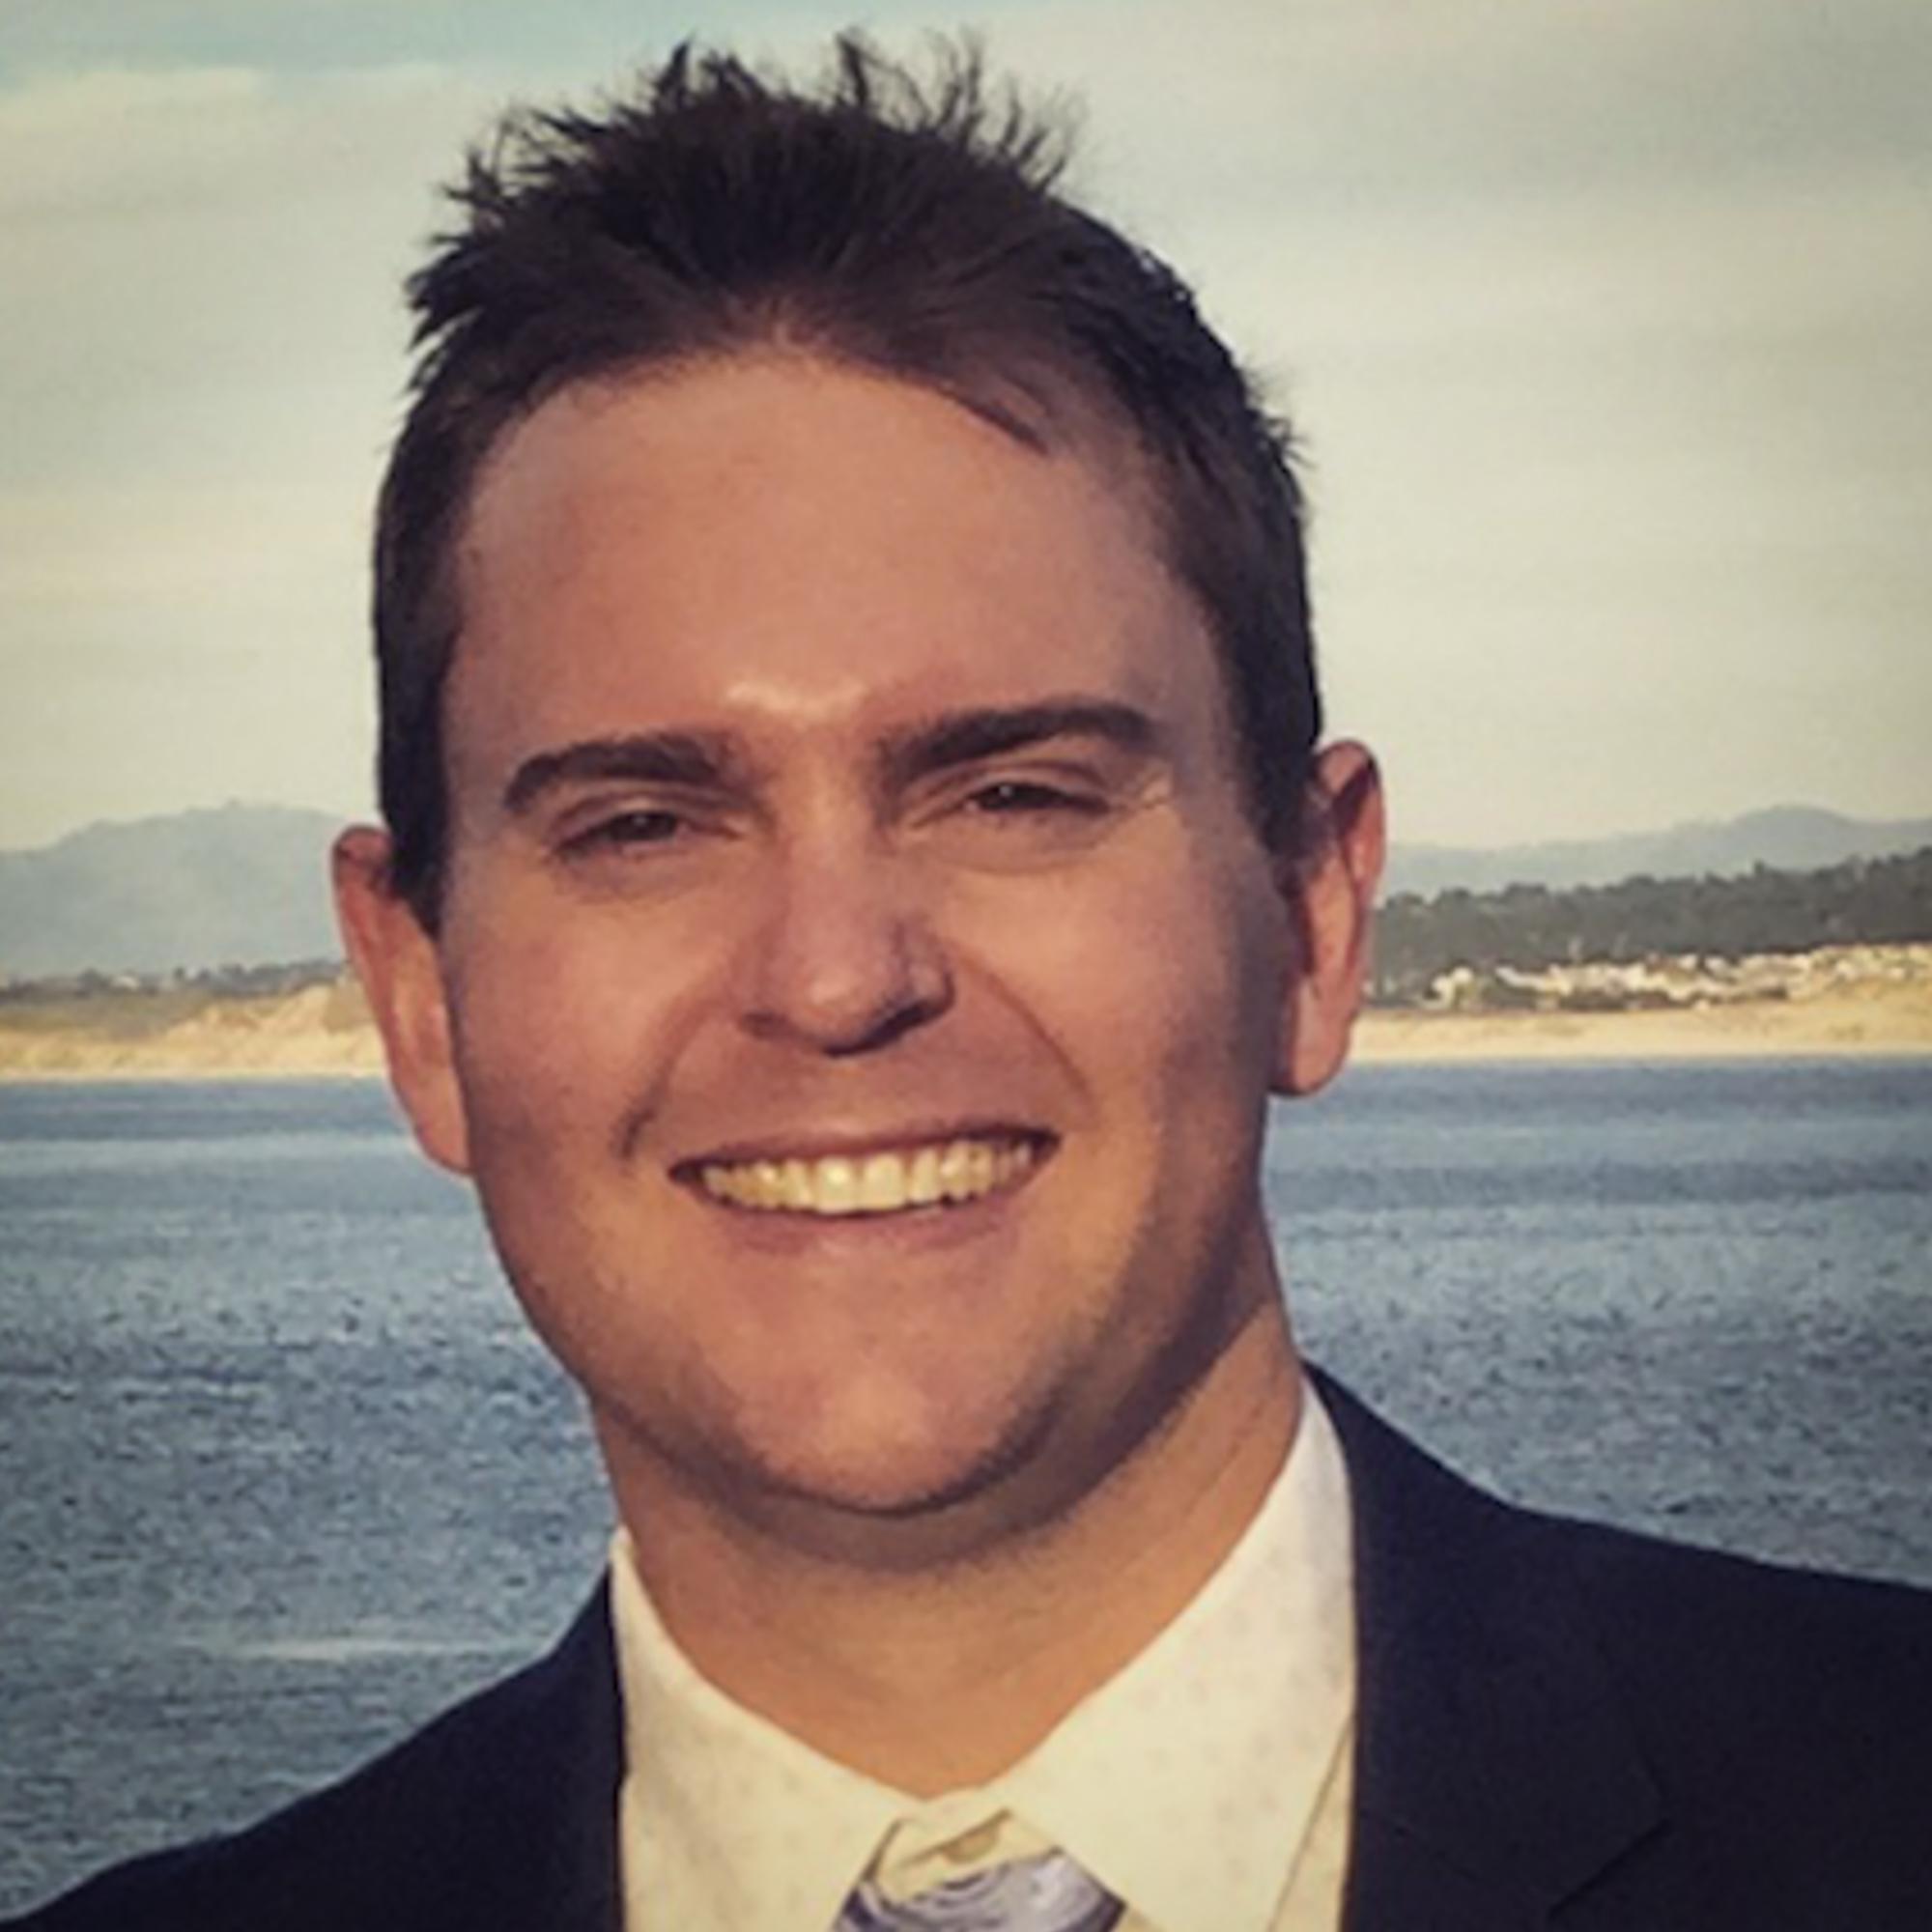 "<a href=""http://www.linkedin.com/in/tdlogan"" target=""_blank""><i>Tom Logan</i></a><br><font size=""-1"">Director of Customer Development</font><br><b>Piqora</b>"